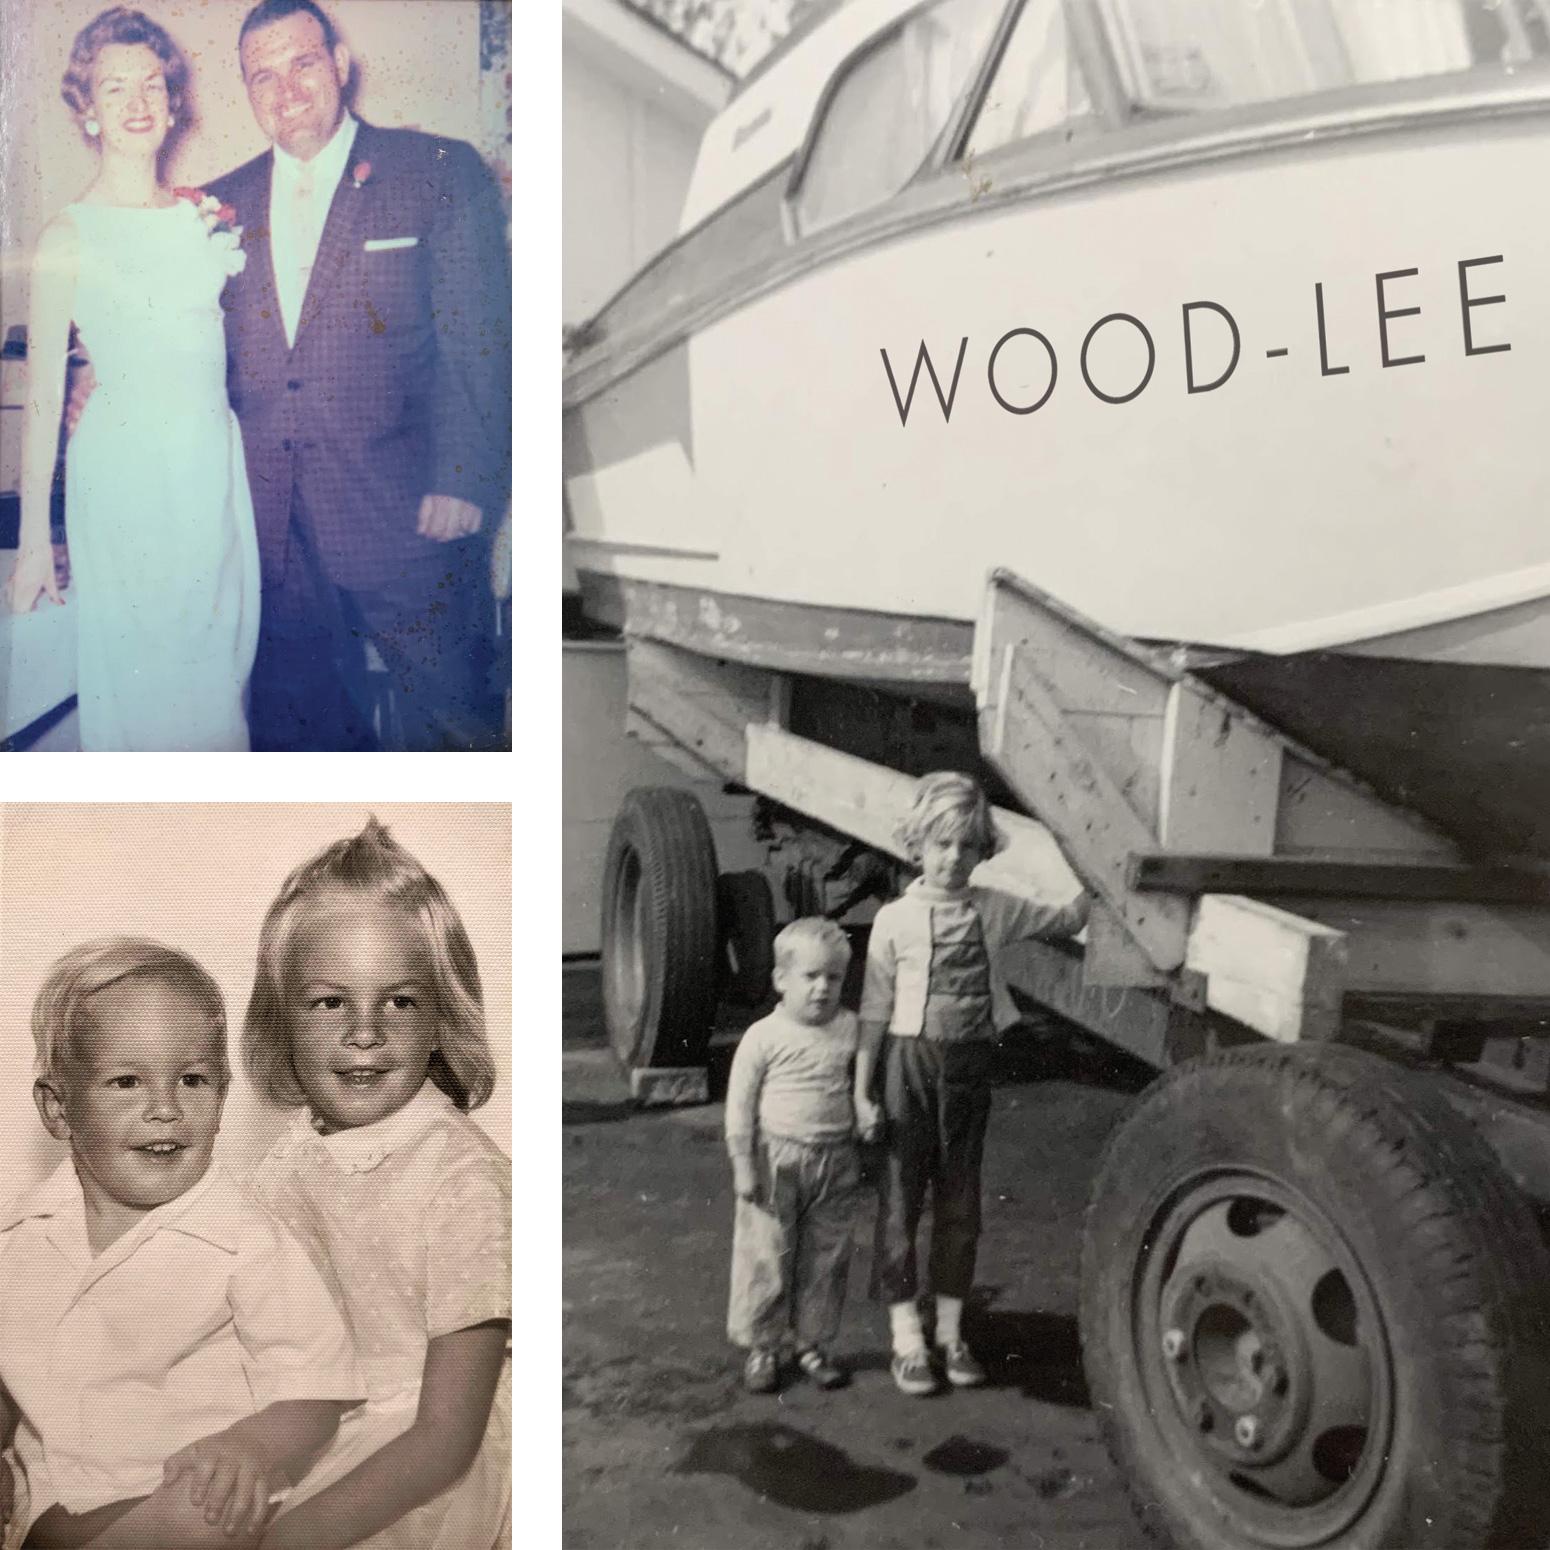 berea-moving-wood-lee-family-owned.jpg